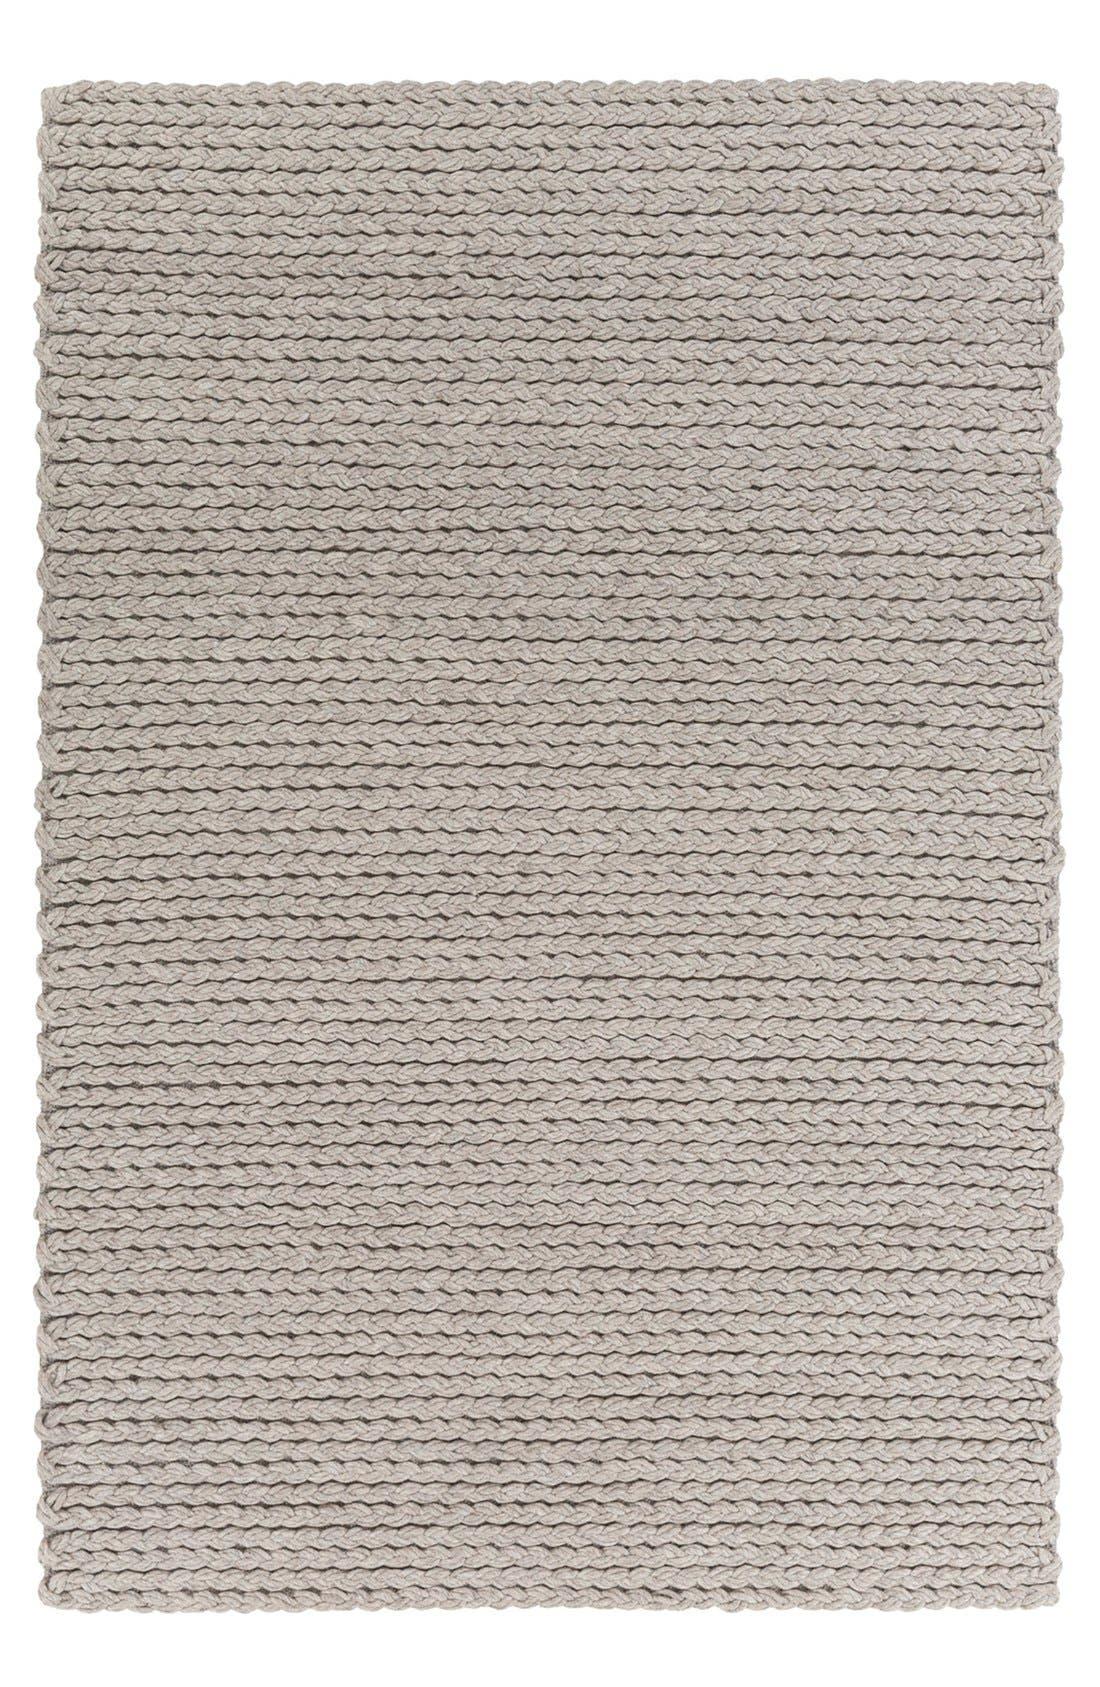 'Yukon' Hand Woven Wool Rug,                         Main,                         color, LIGHT GREY